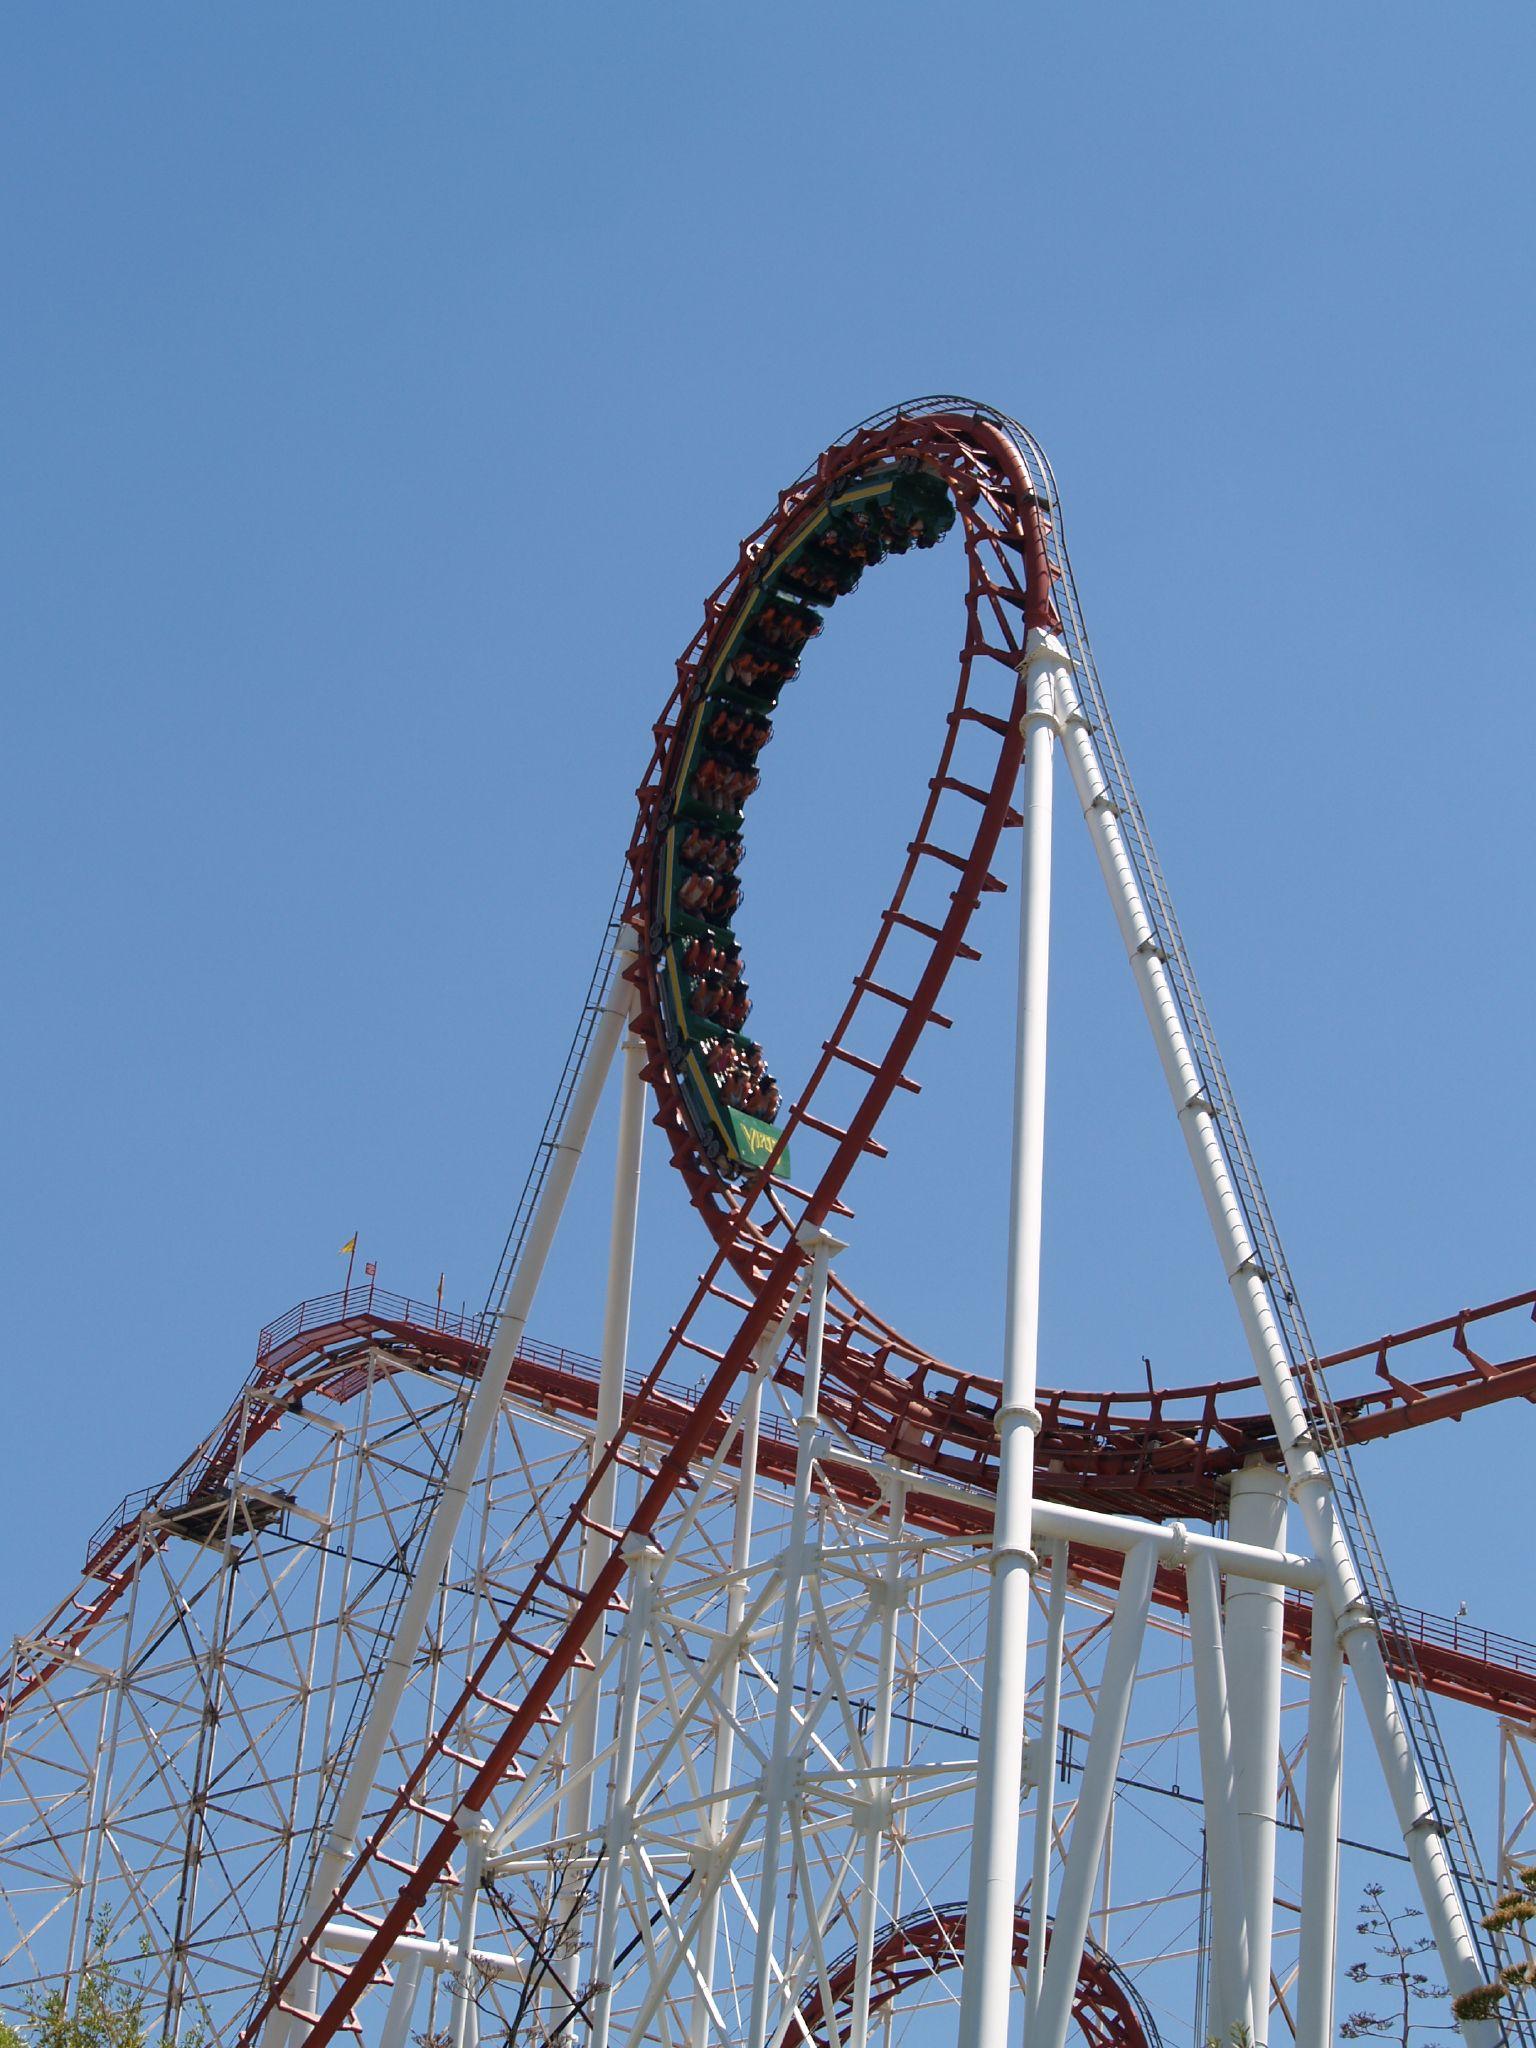 File:Viper vertical loop (Six Flags Magic Mountain).jpg